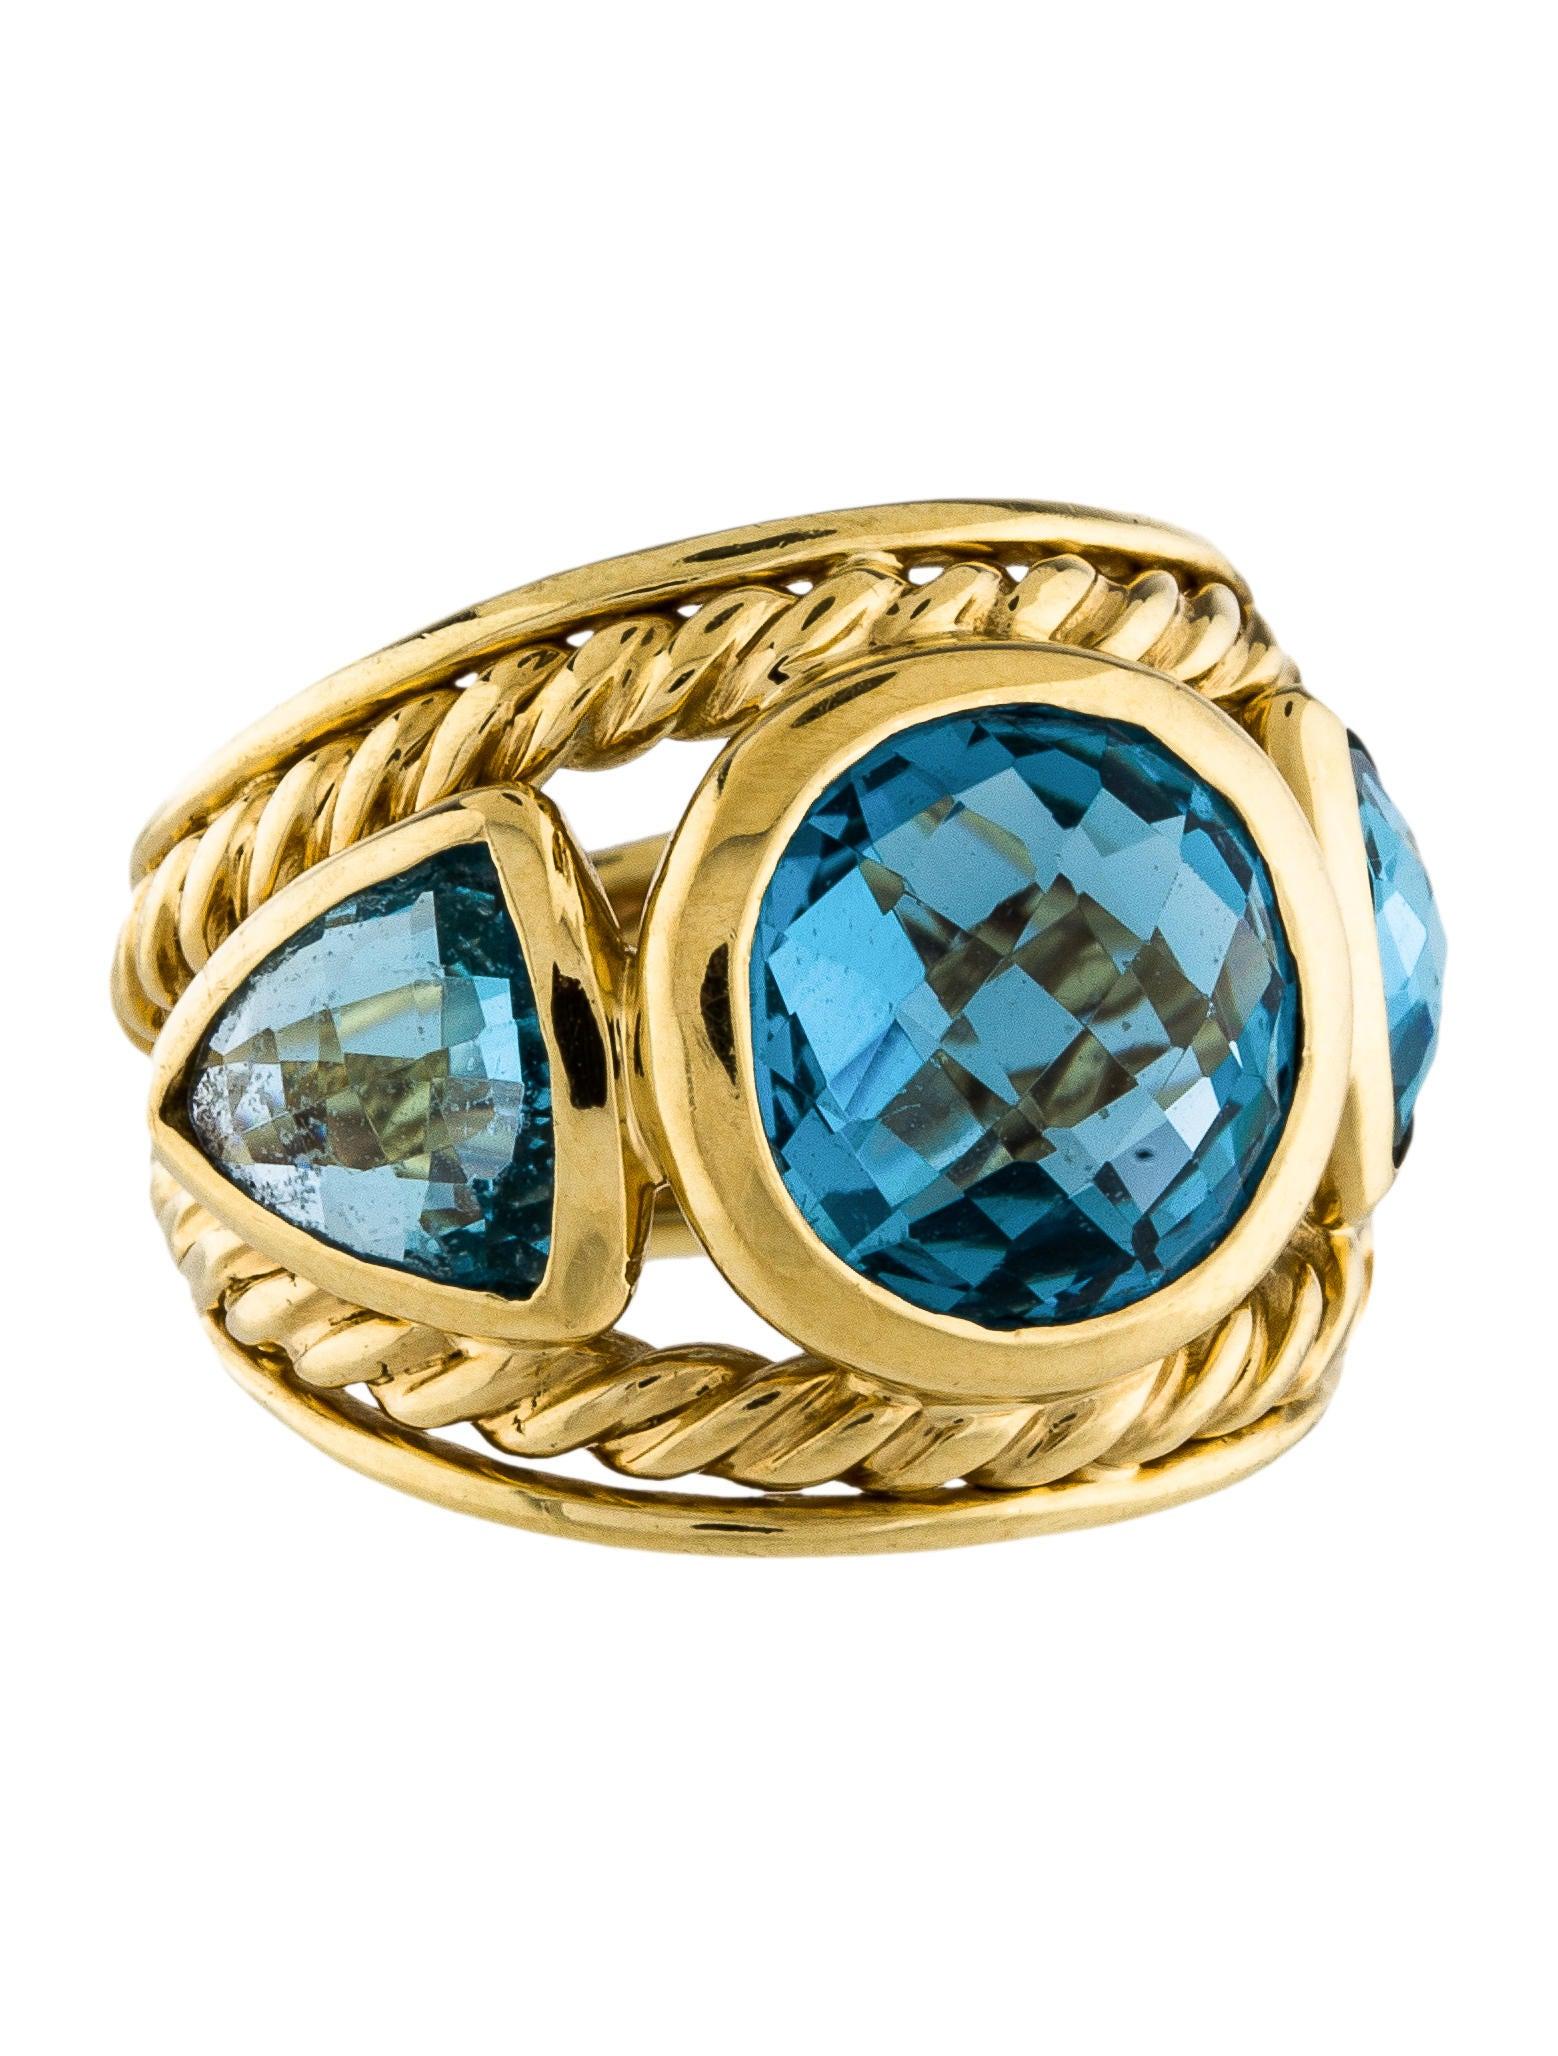 David yurman 18k topaz renaissance ring rings dvy41723 for David yurman inspired jewelry rings